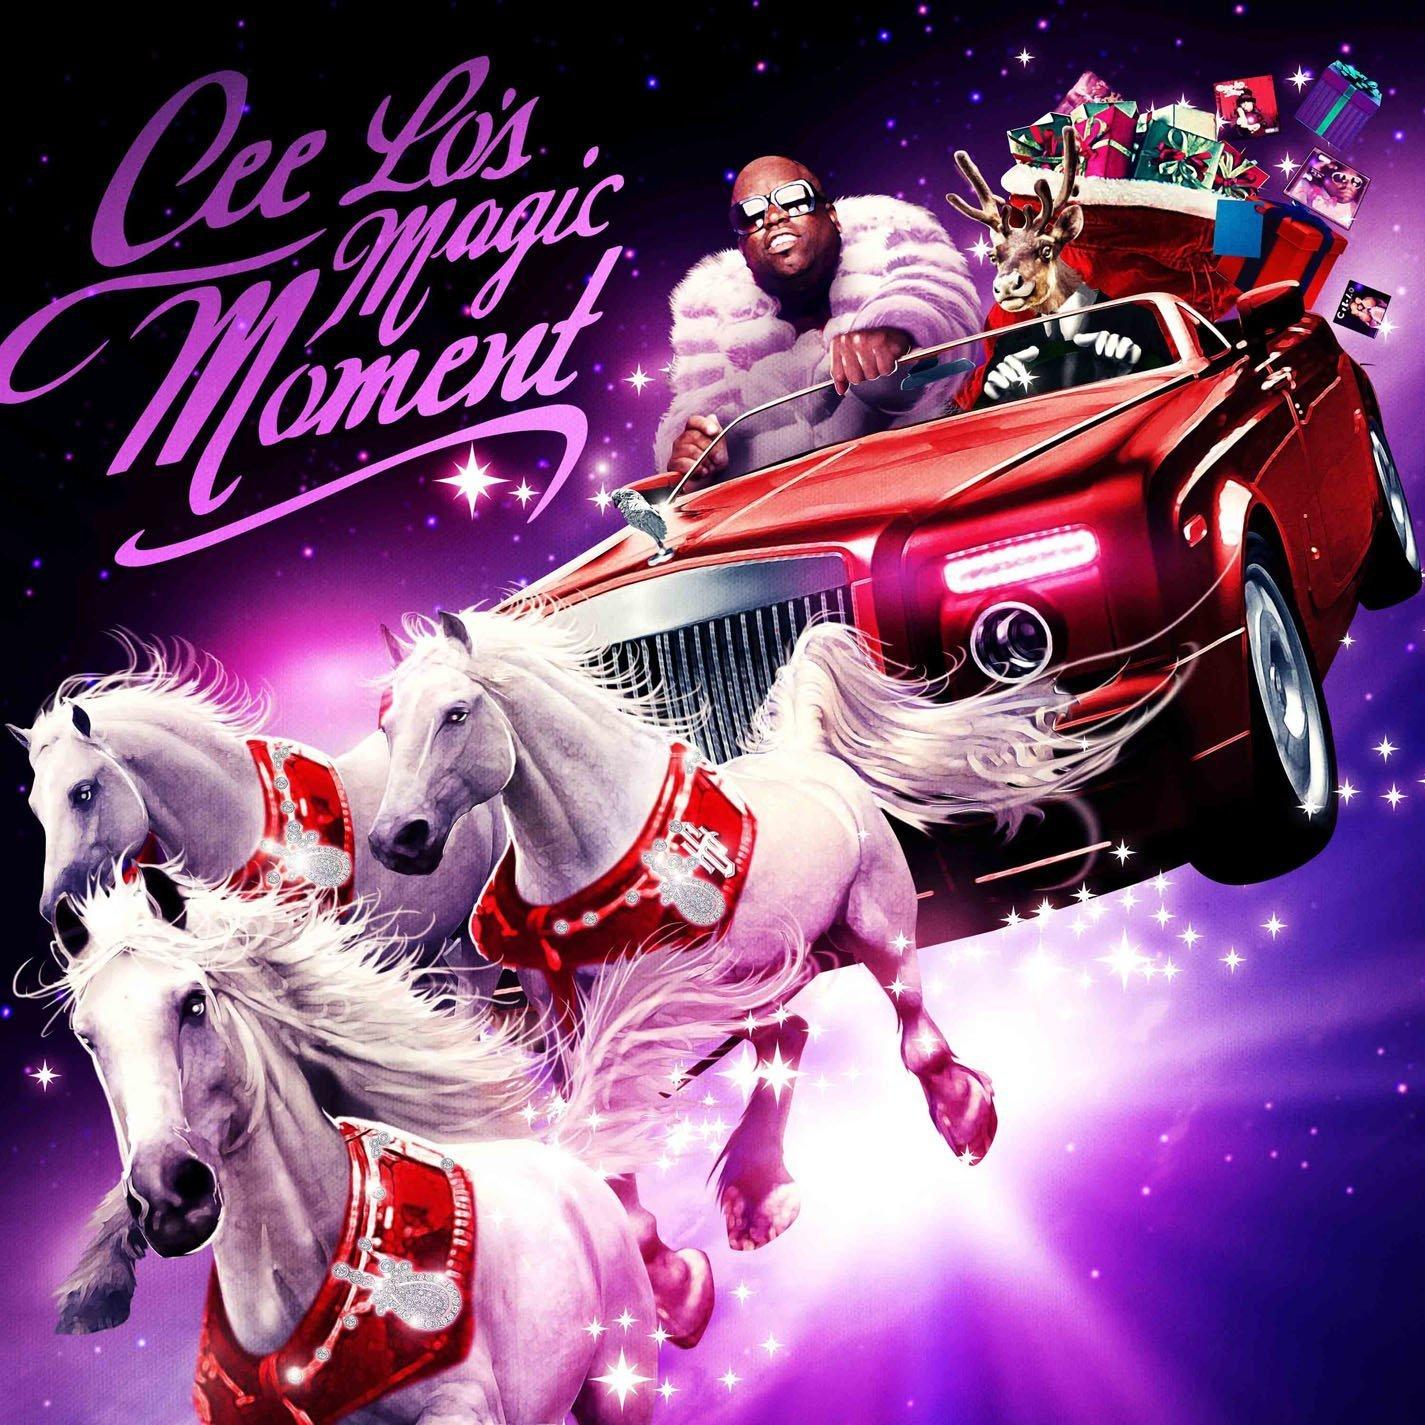 Cee Lo Green:CeeLo's Magic Moment (Vocals)